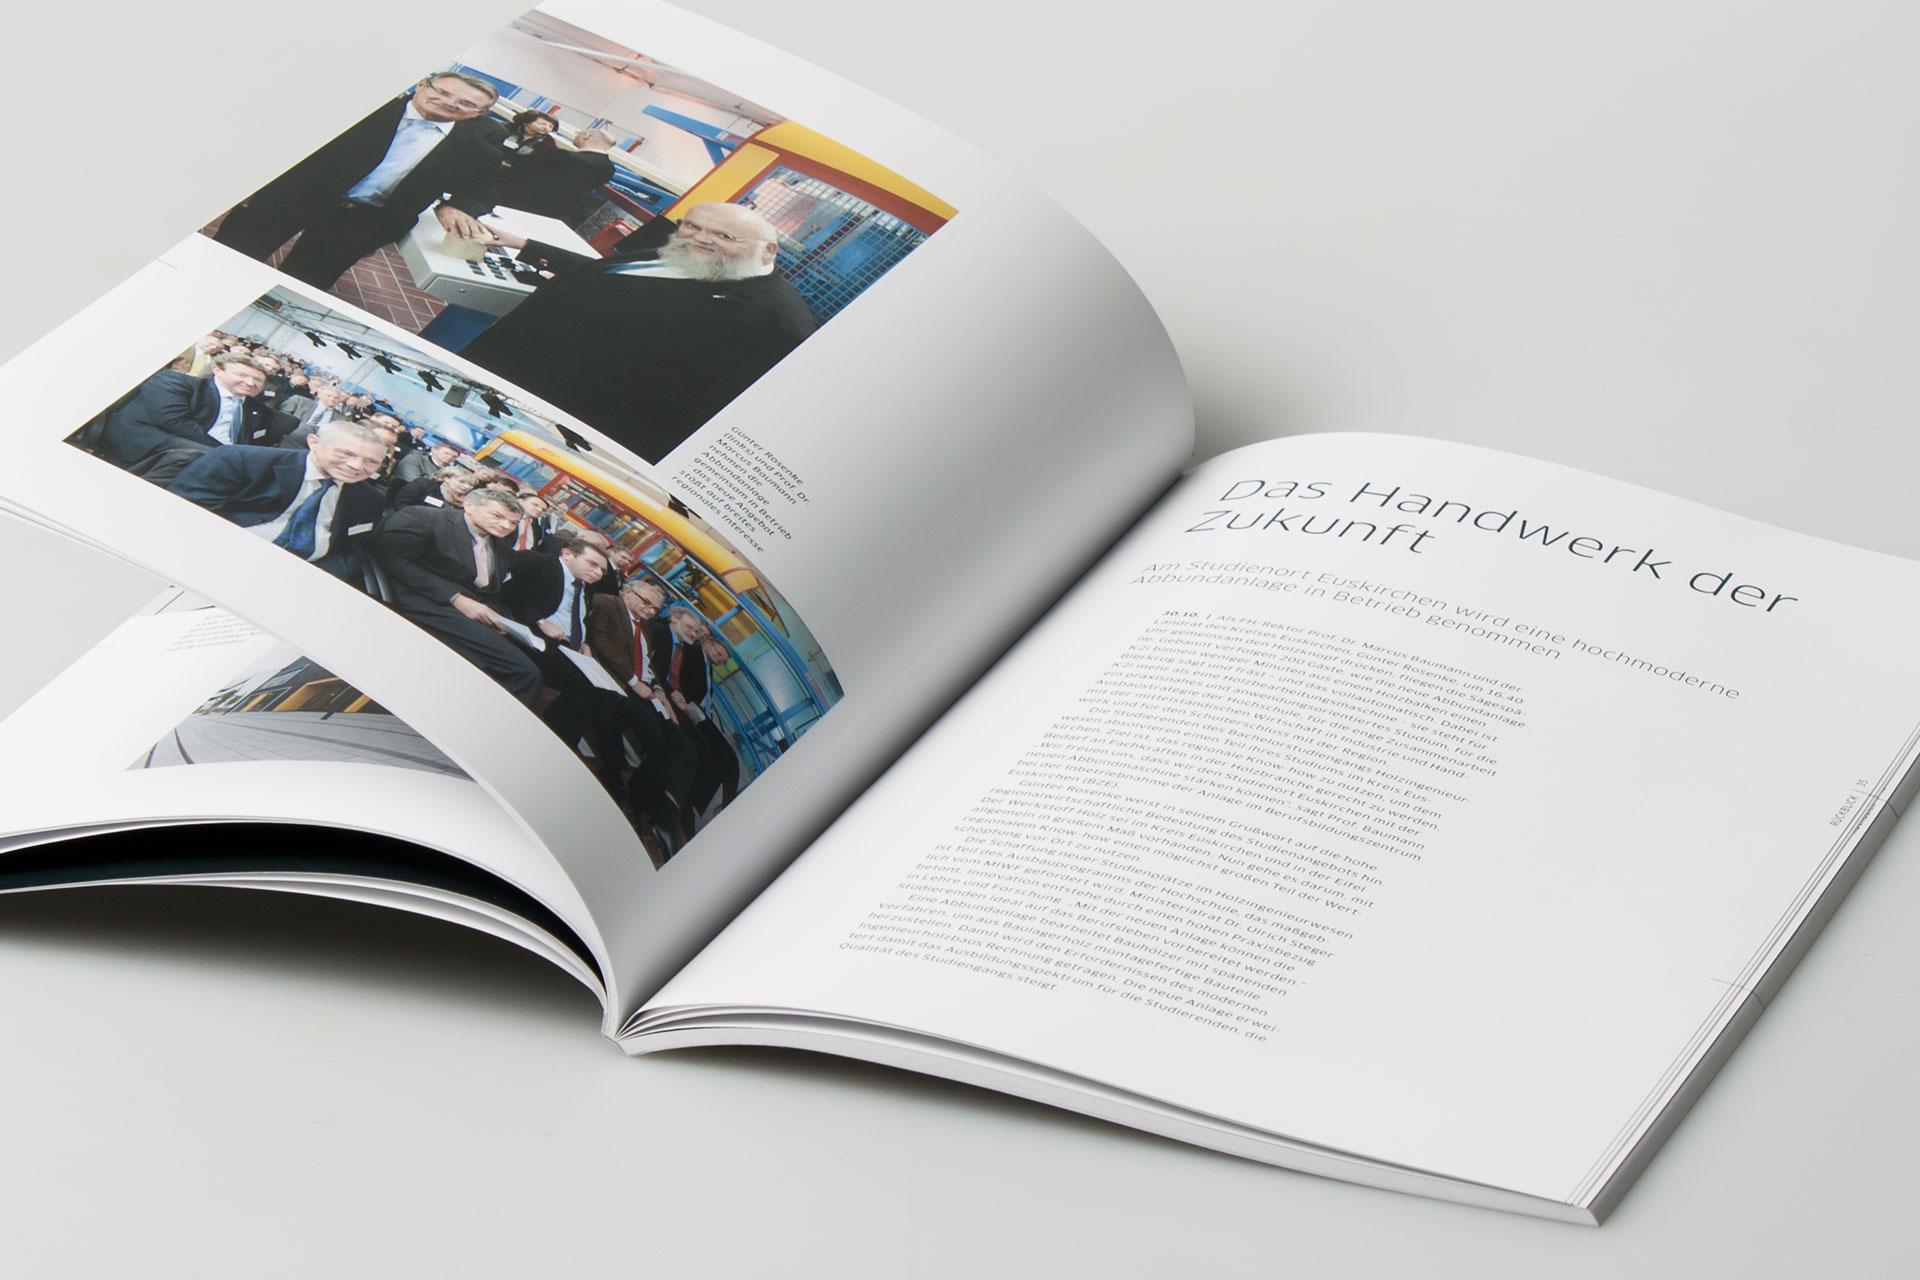 Bericht des Rektorats